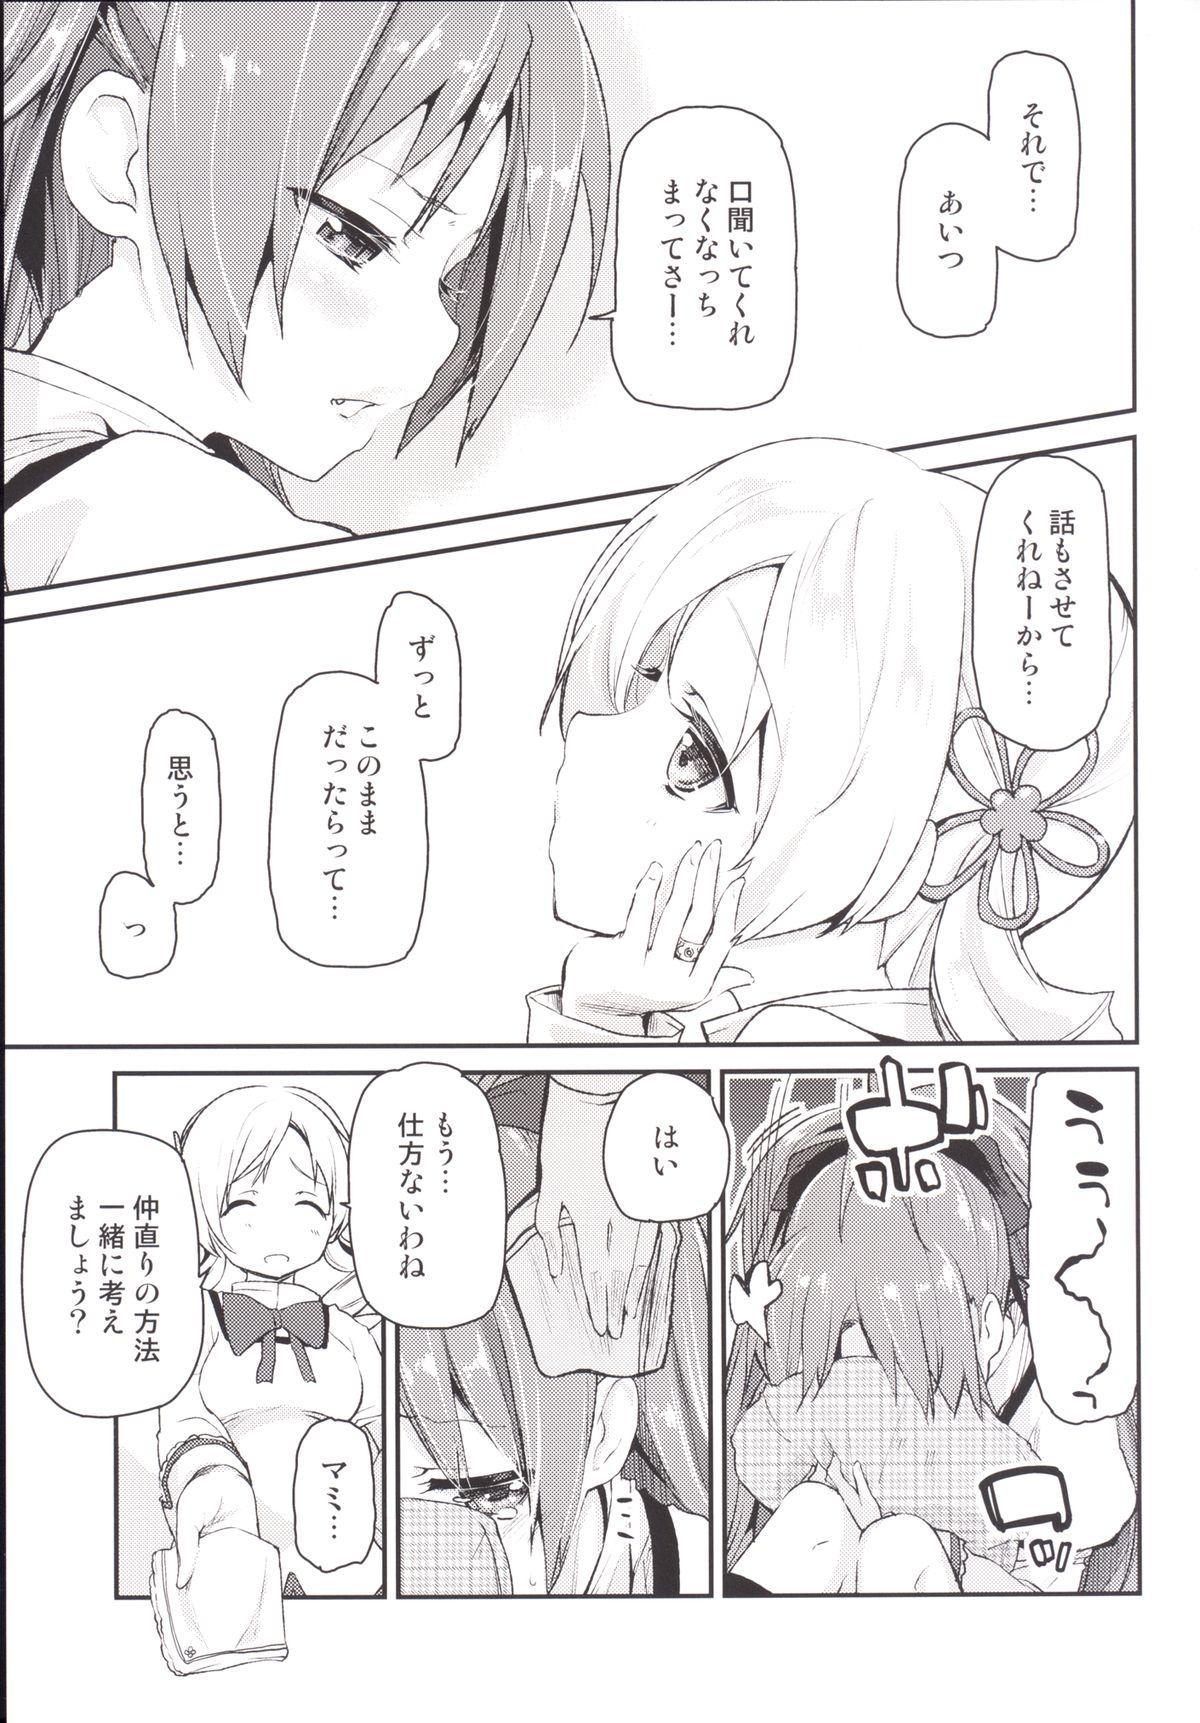 Sakura-san ga Tottemo Kawaii Kara 5